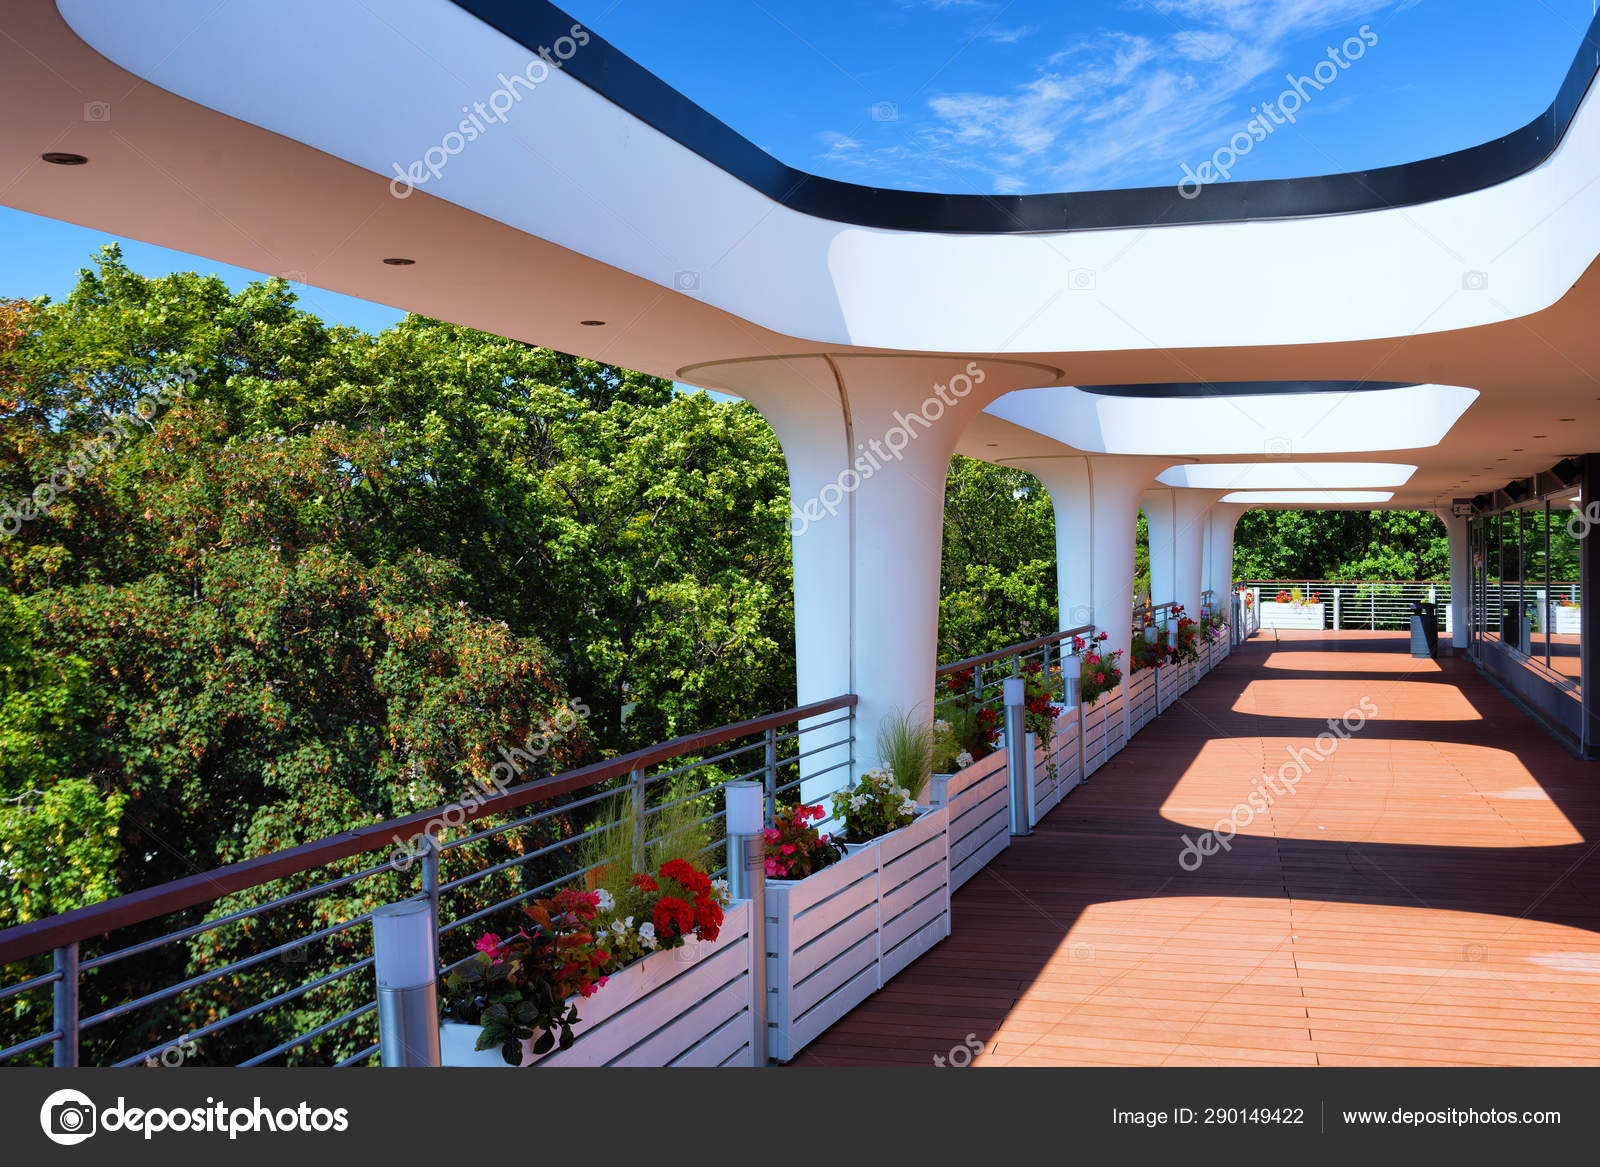 Terraza De Un Edificio Moderno En Un Día De Verano Foto